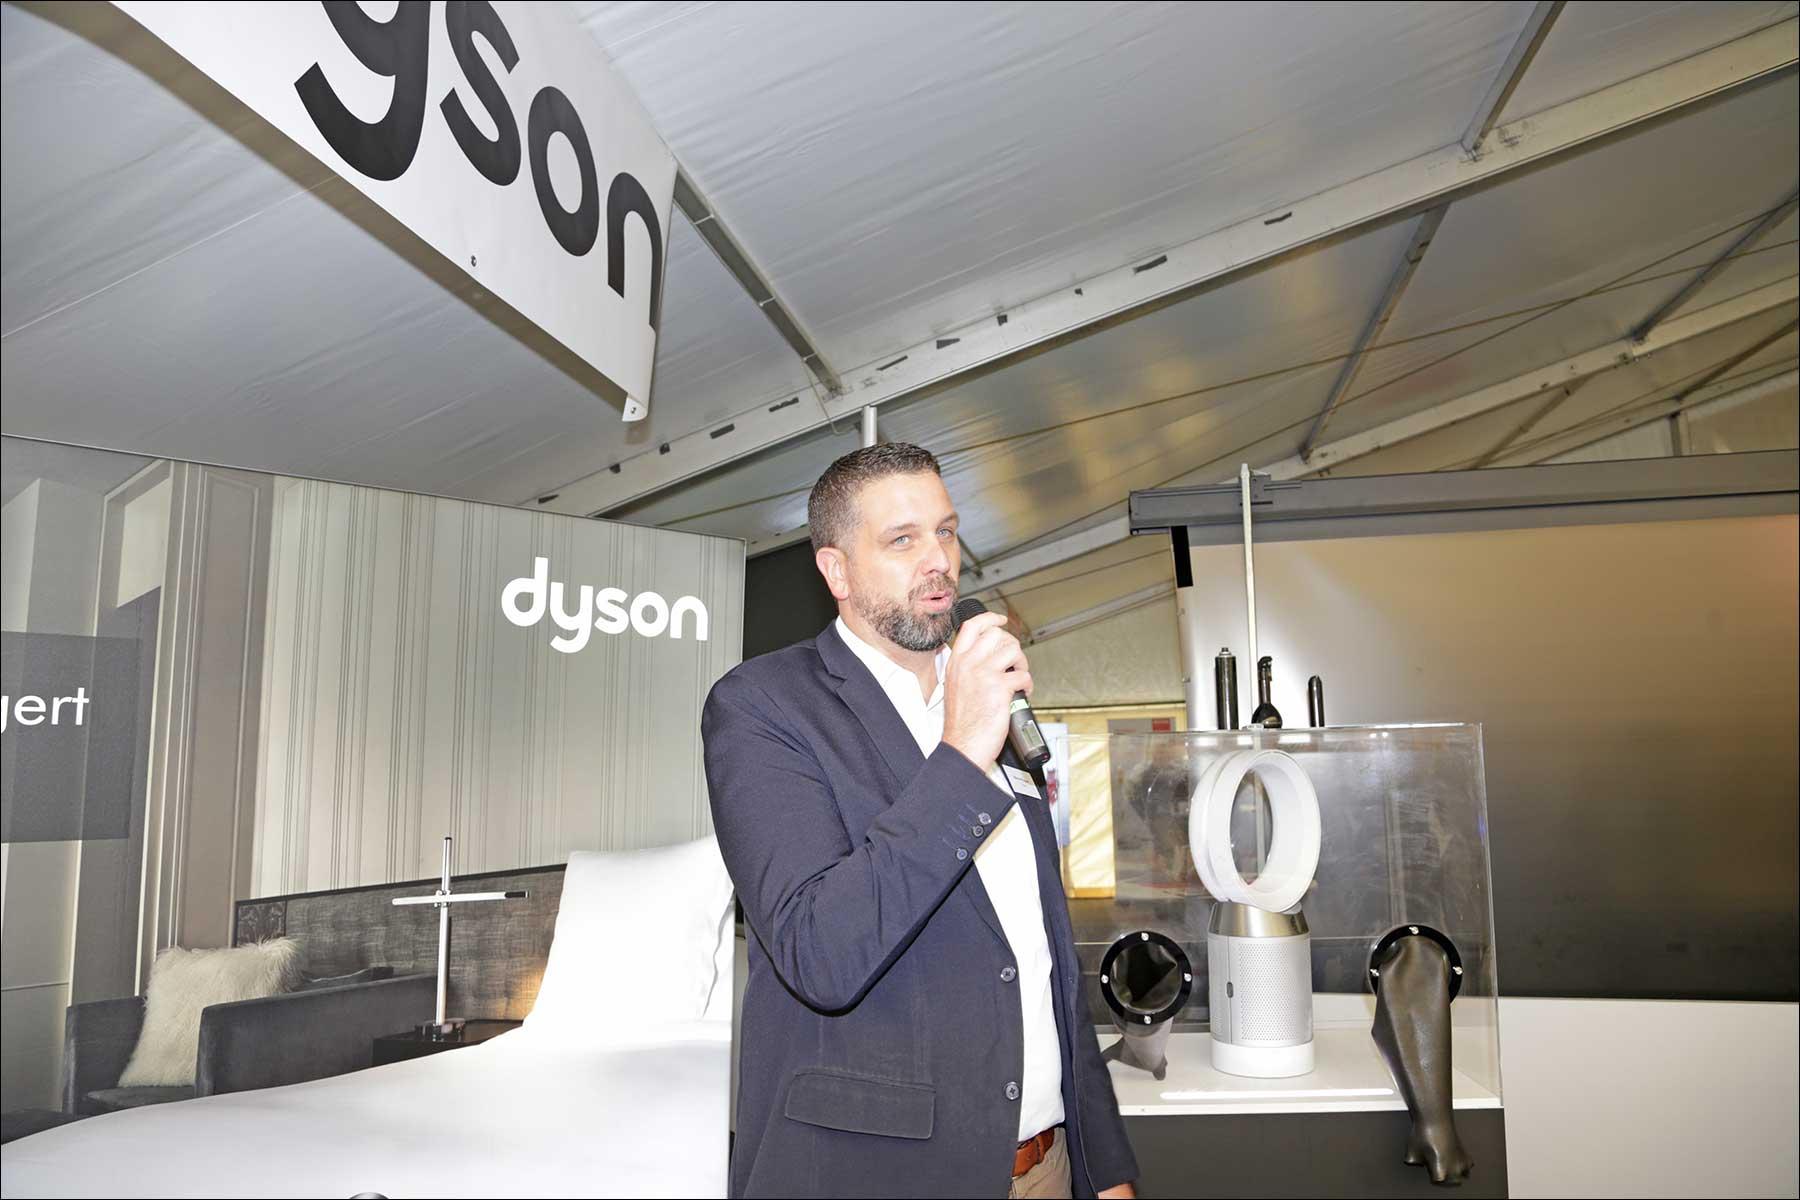 Manuel Ruppert von Dyson beim COMM-TEC S14 Solutions Day 2018